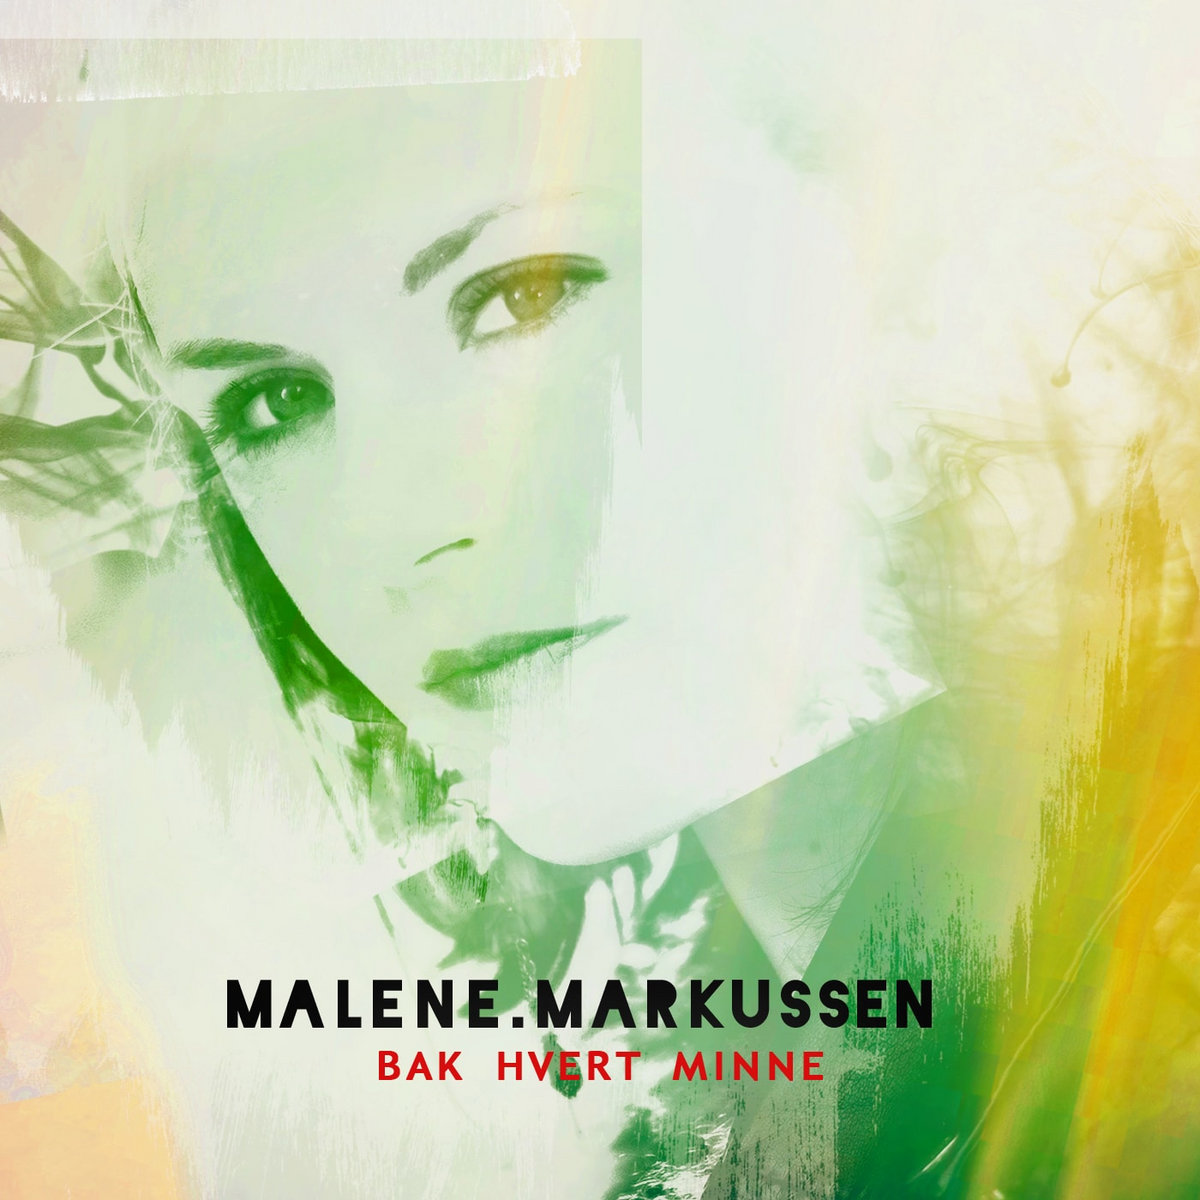 Bak Hvert Minne by Malene Markussen